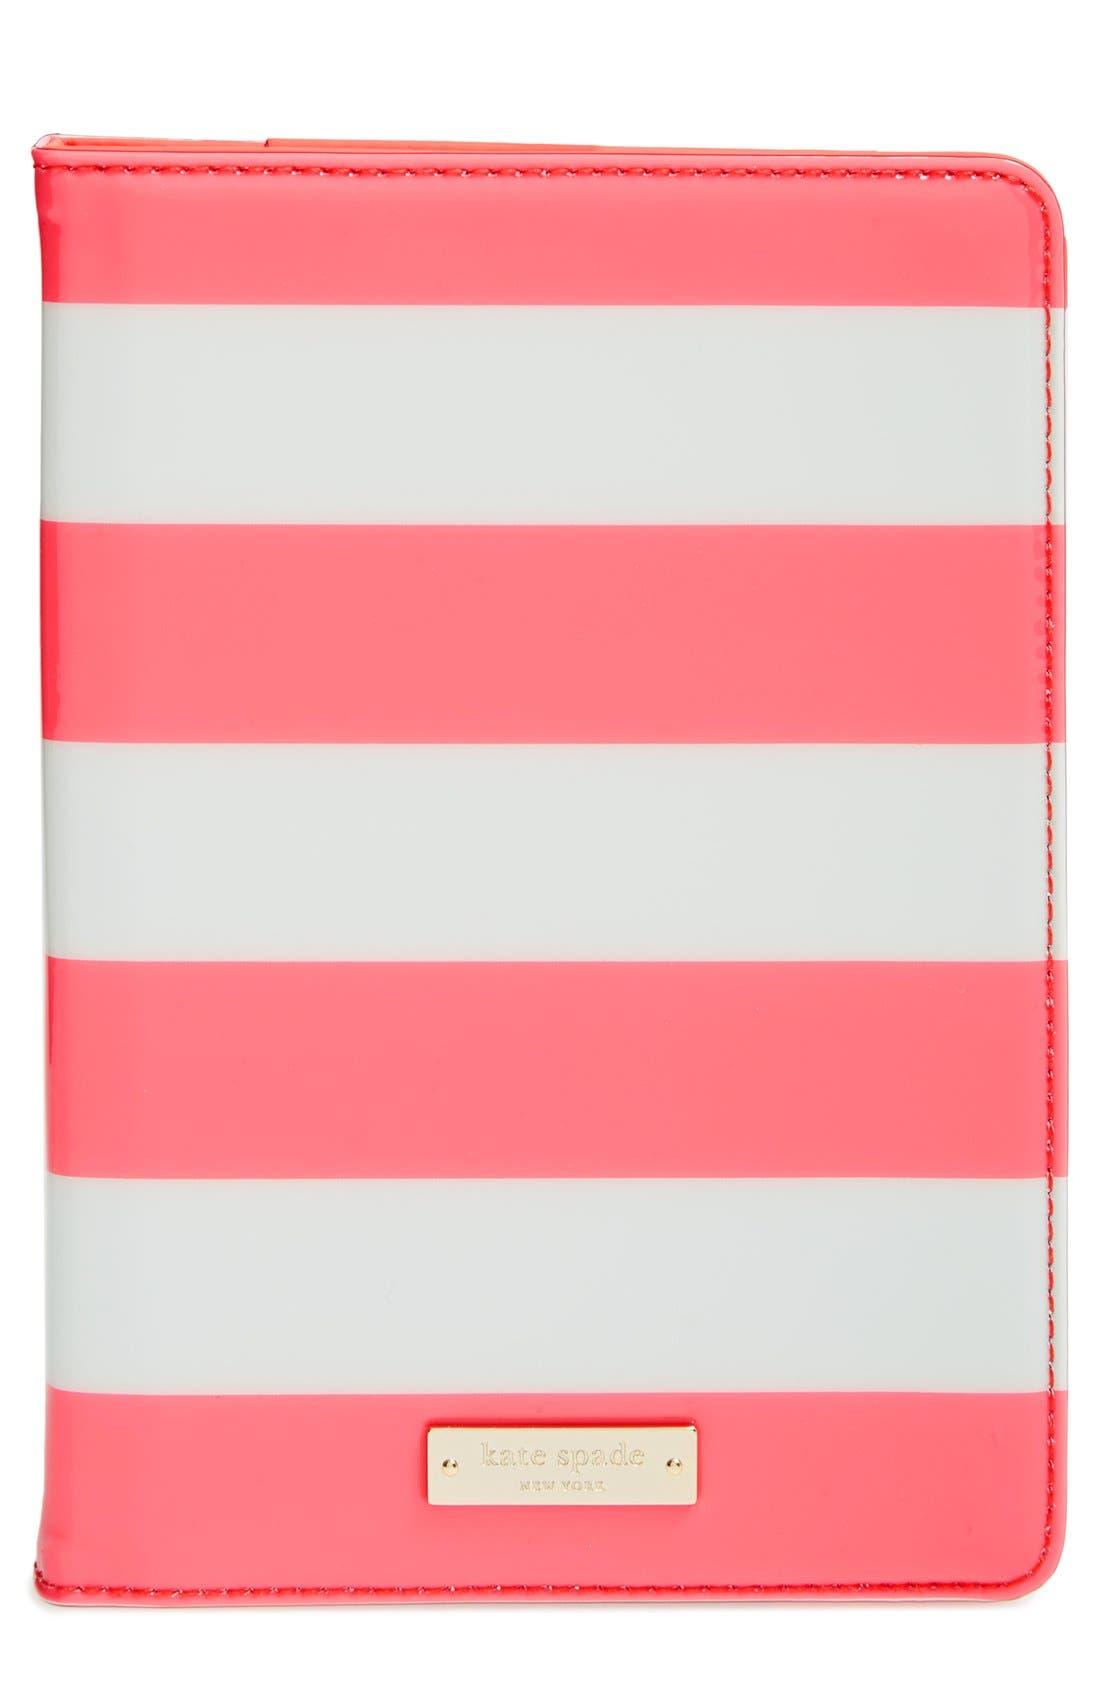 Alternate Image 1 Selected - kate spade new york 'fairmont square' iPad mini hardcase folio